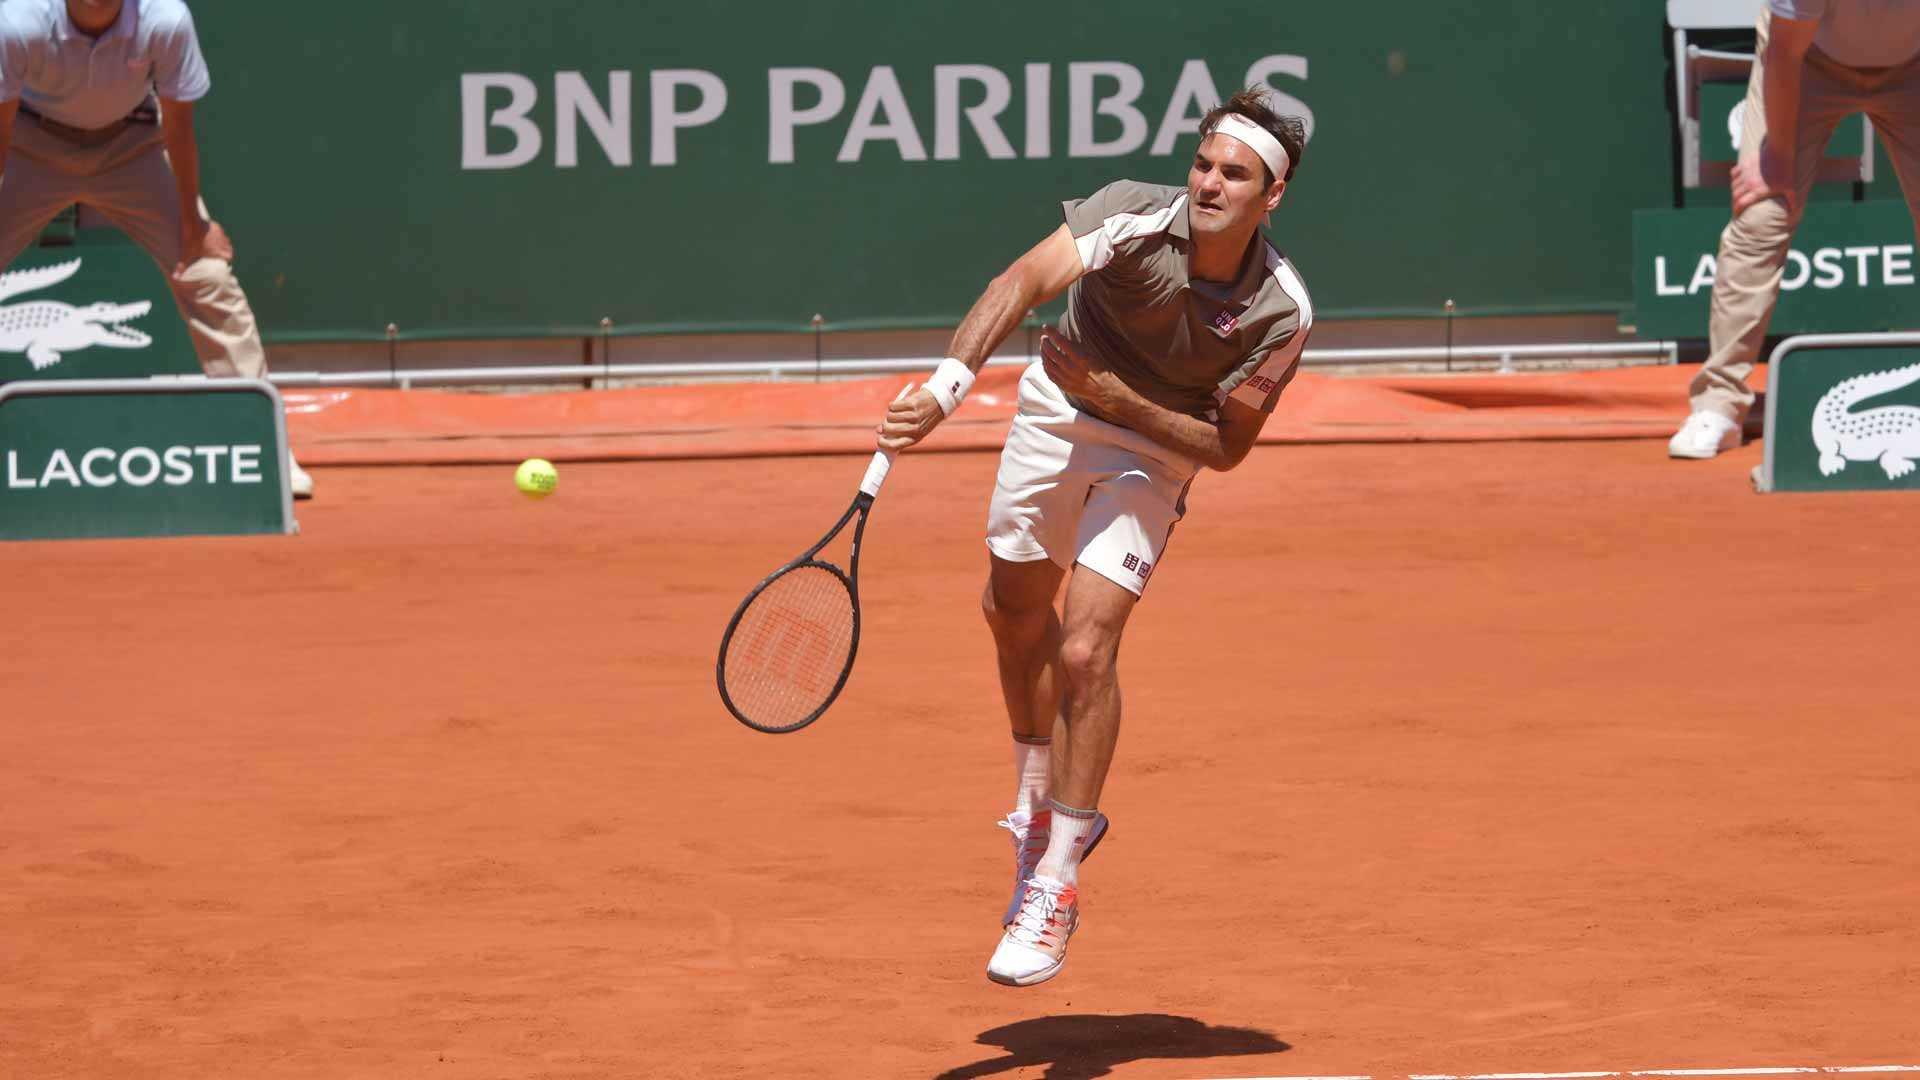 listas-wiseplay-Roland-Garros